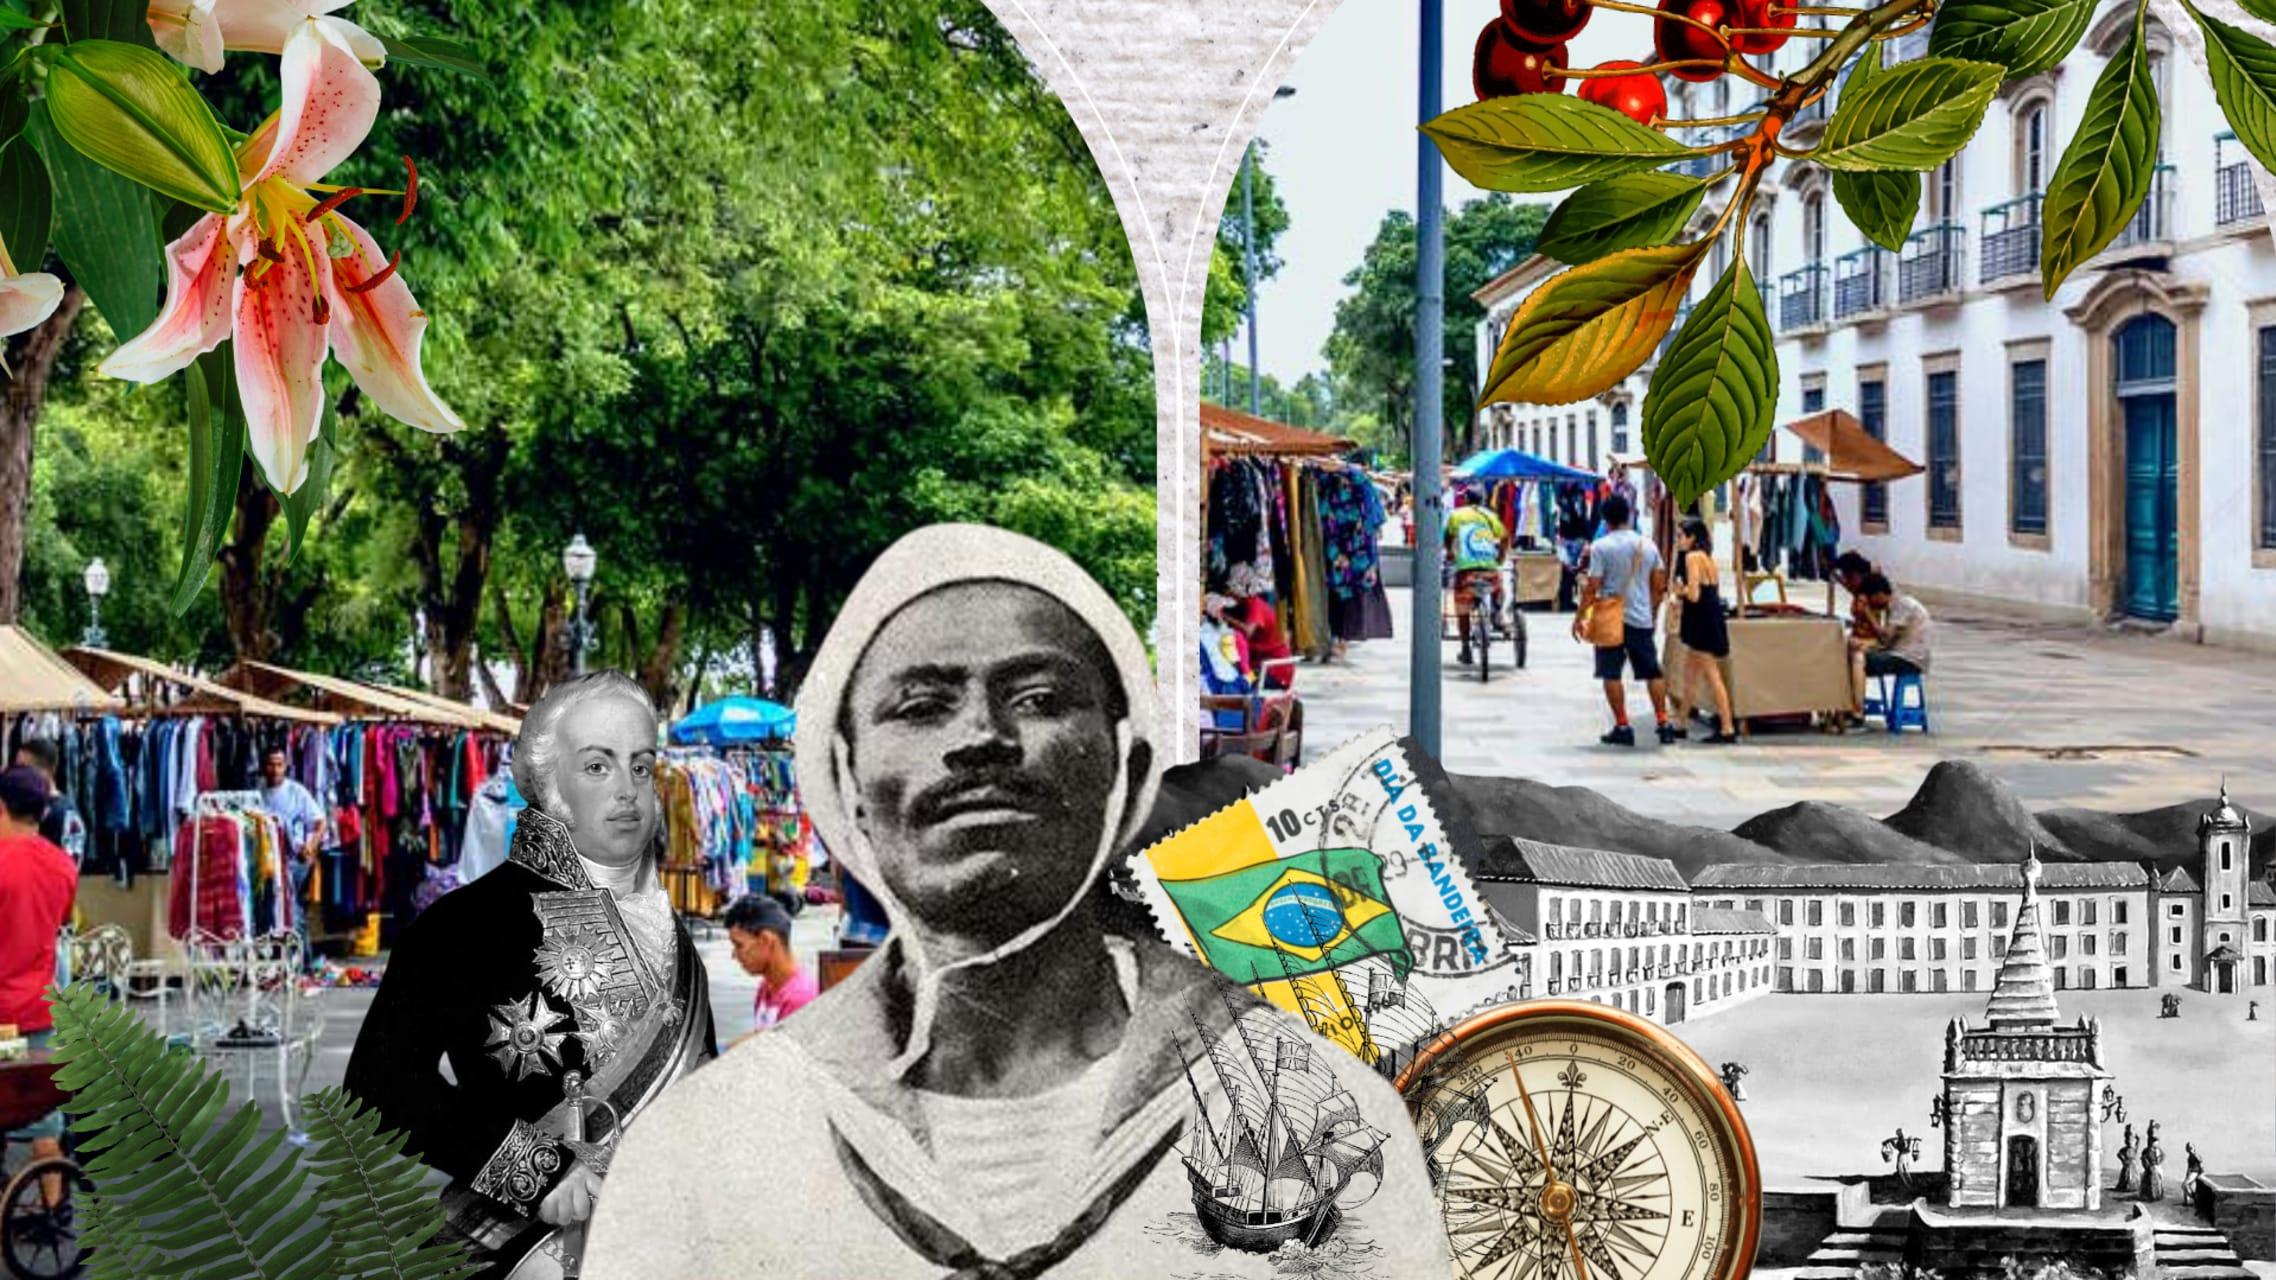 Rio de Janeiro - Antiquing at the XV Square Market: The runaway royal family